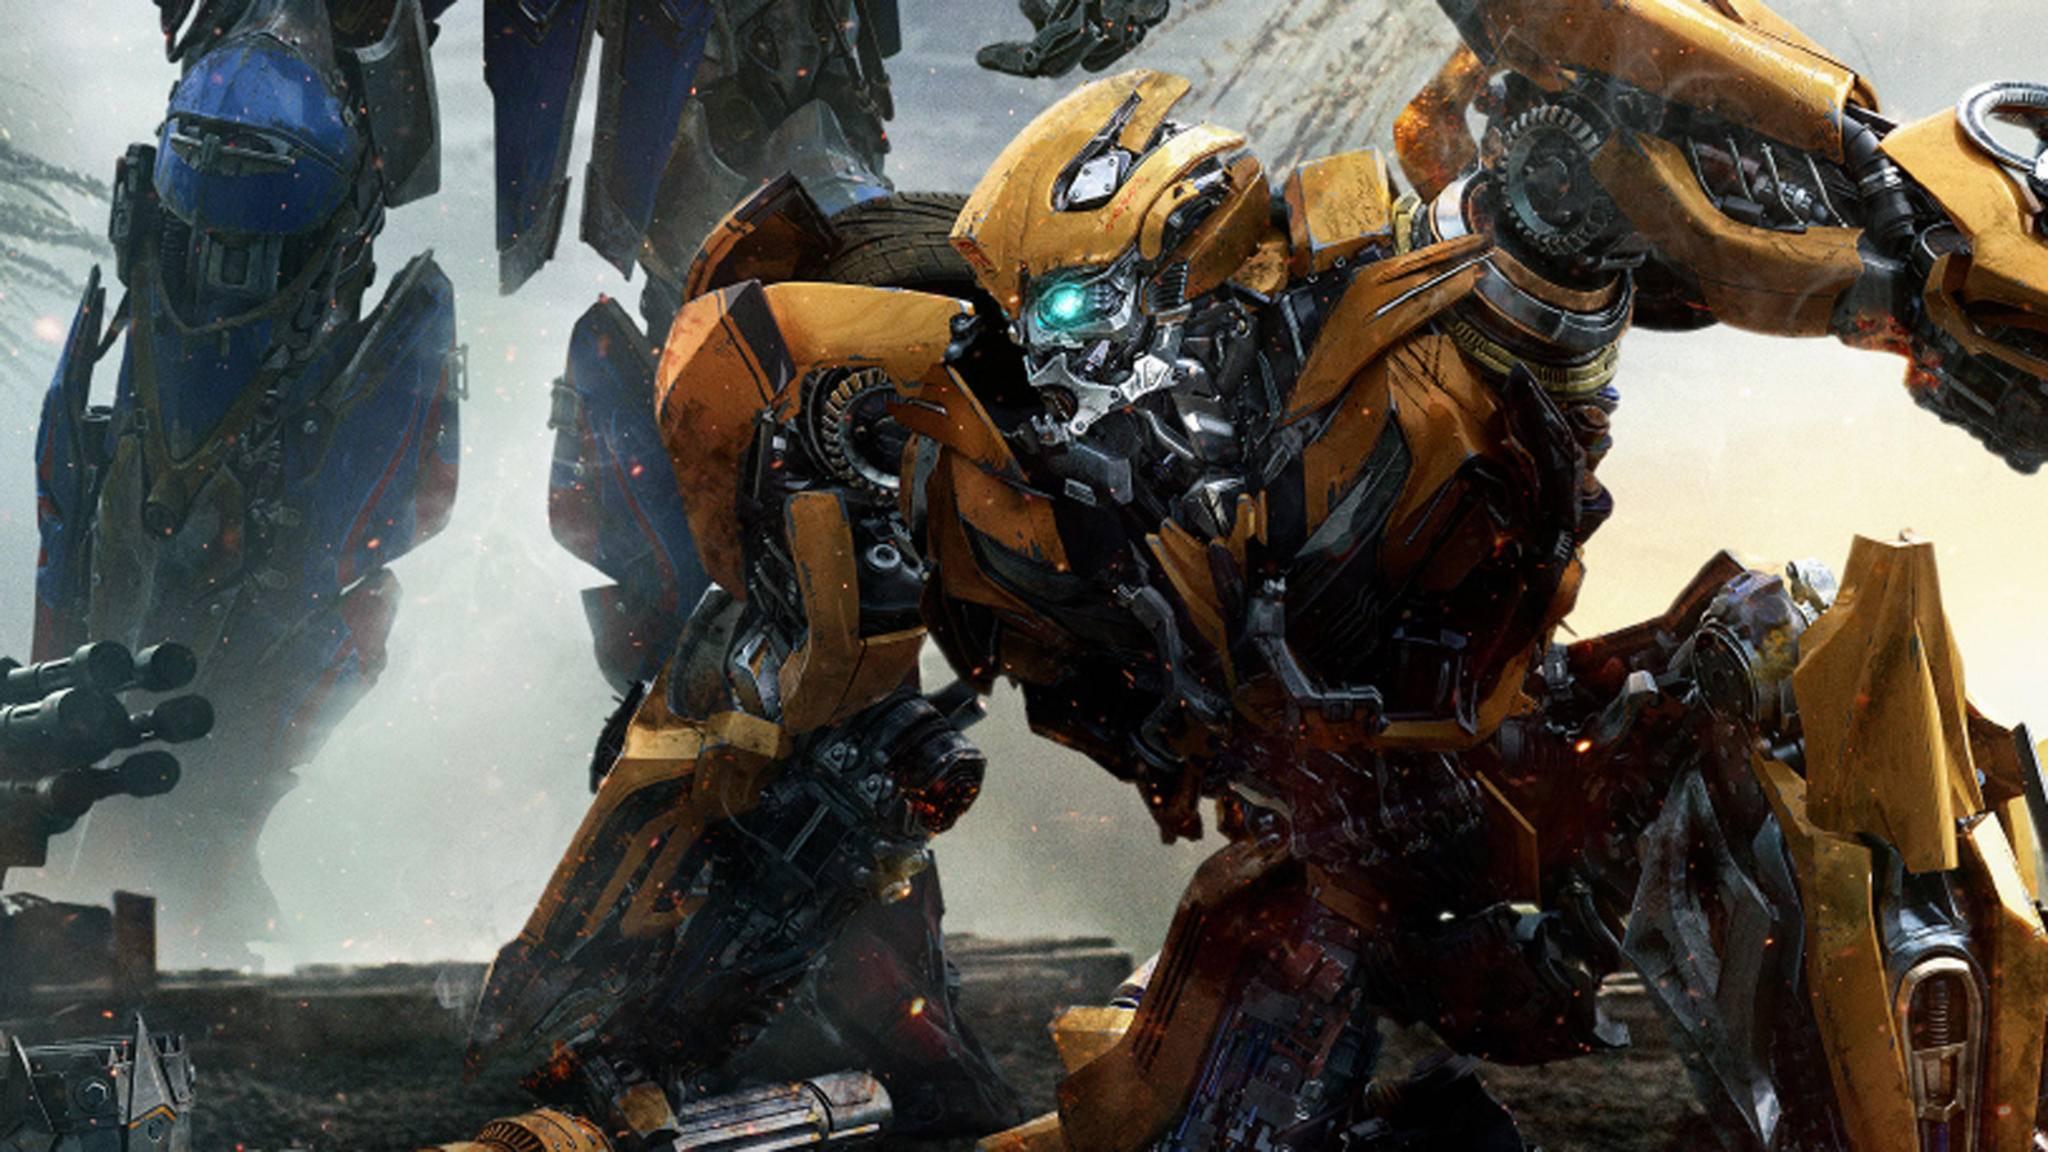 Transformers Filme Reihenfolge